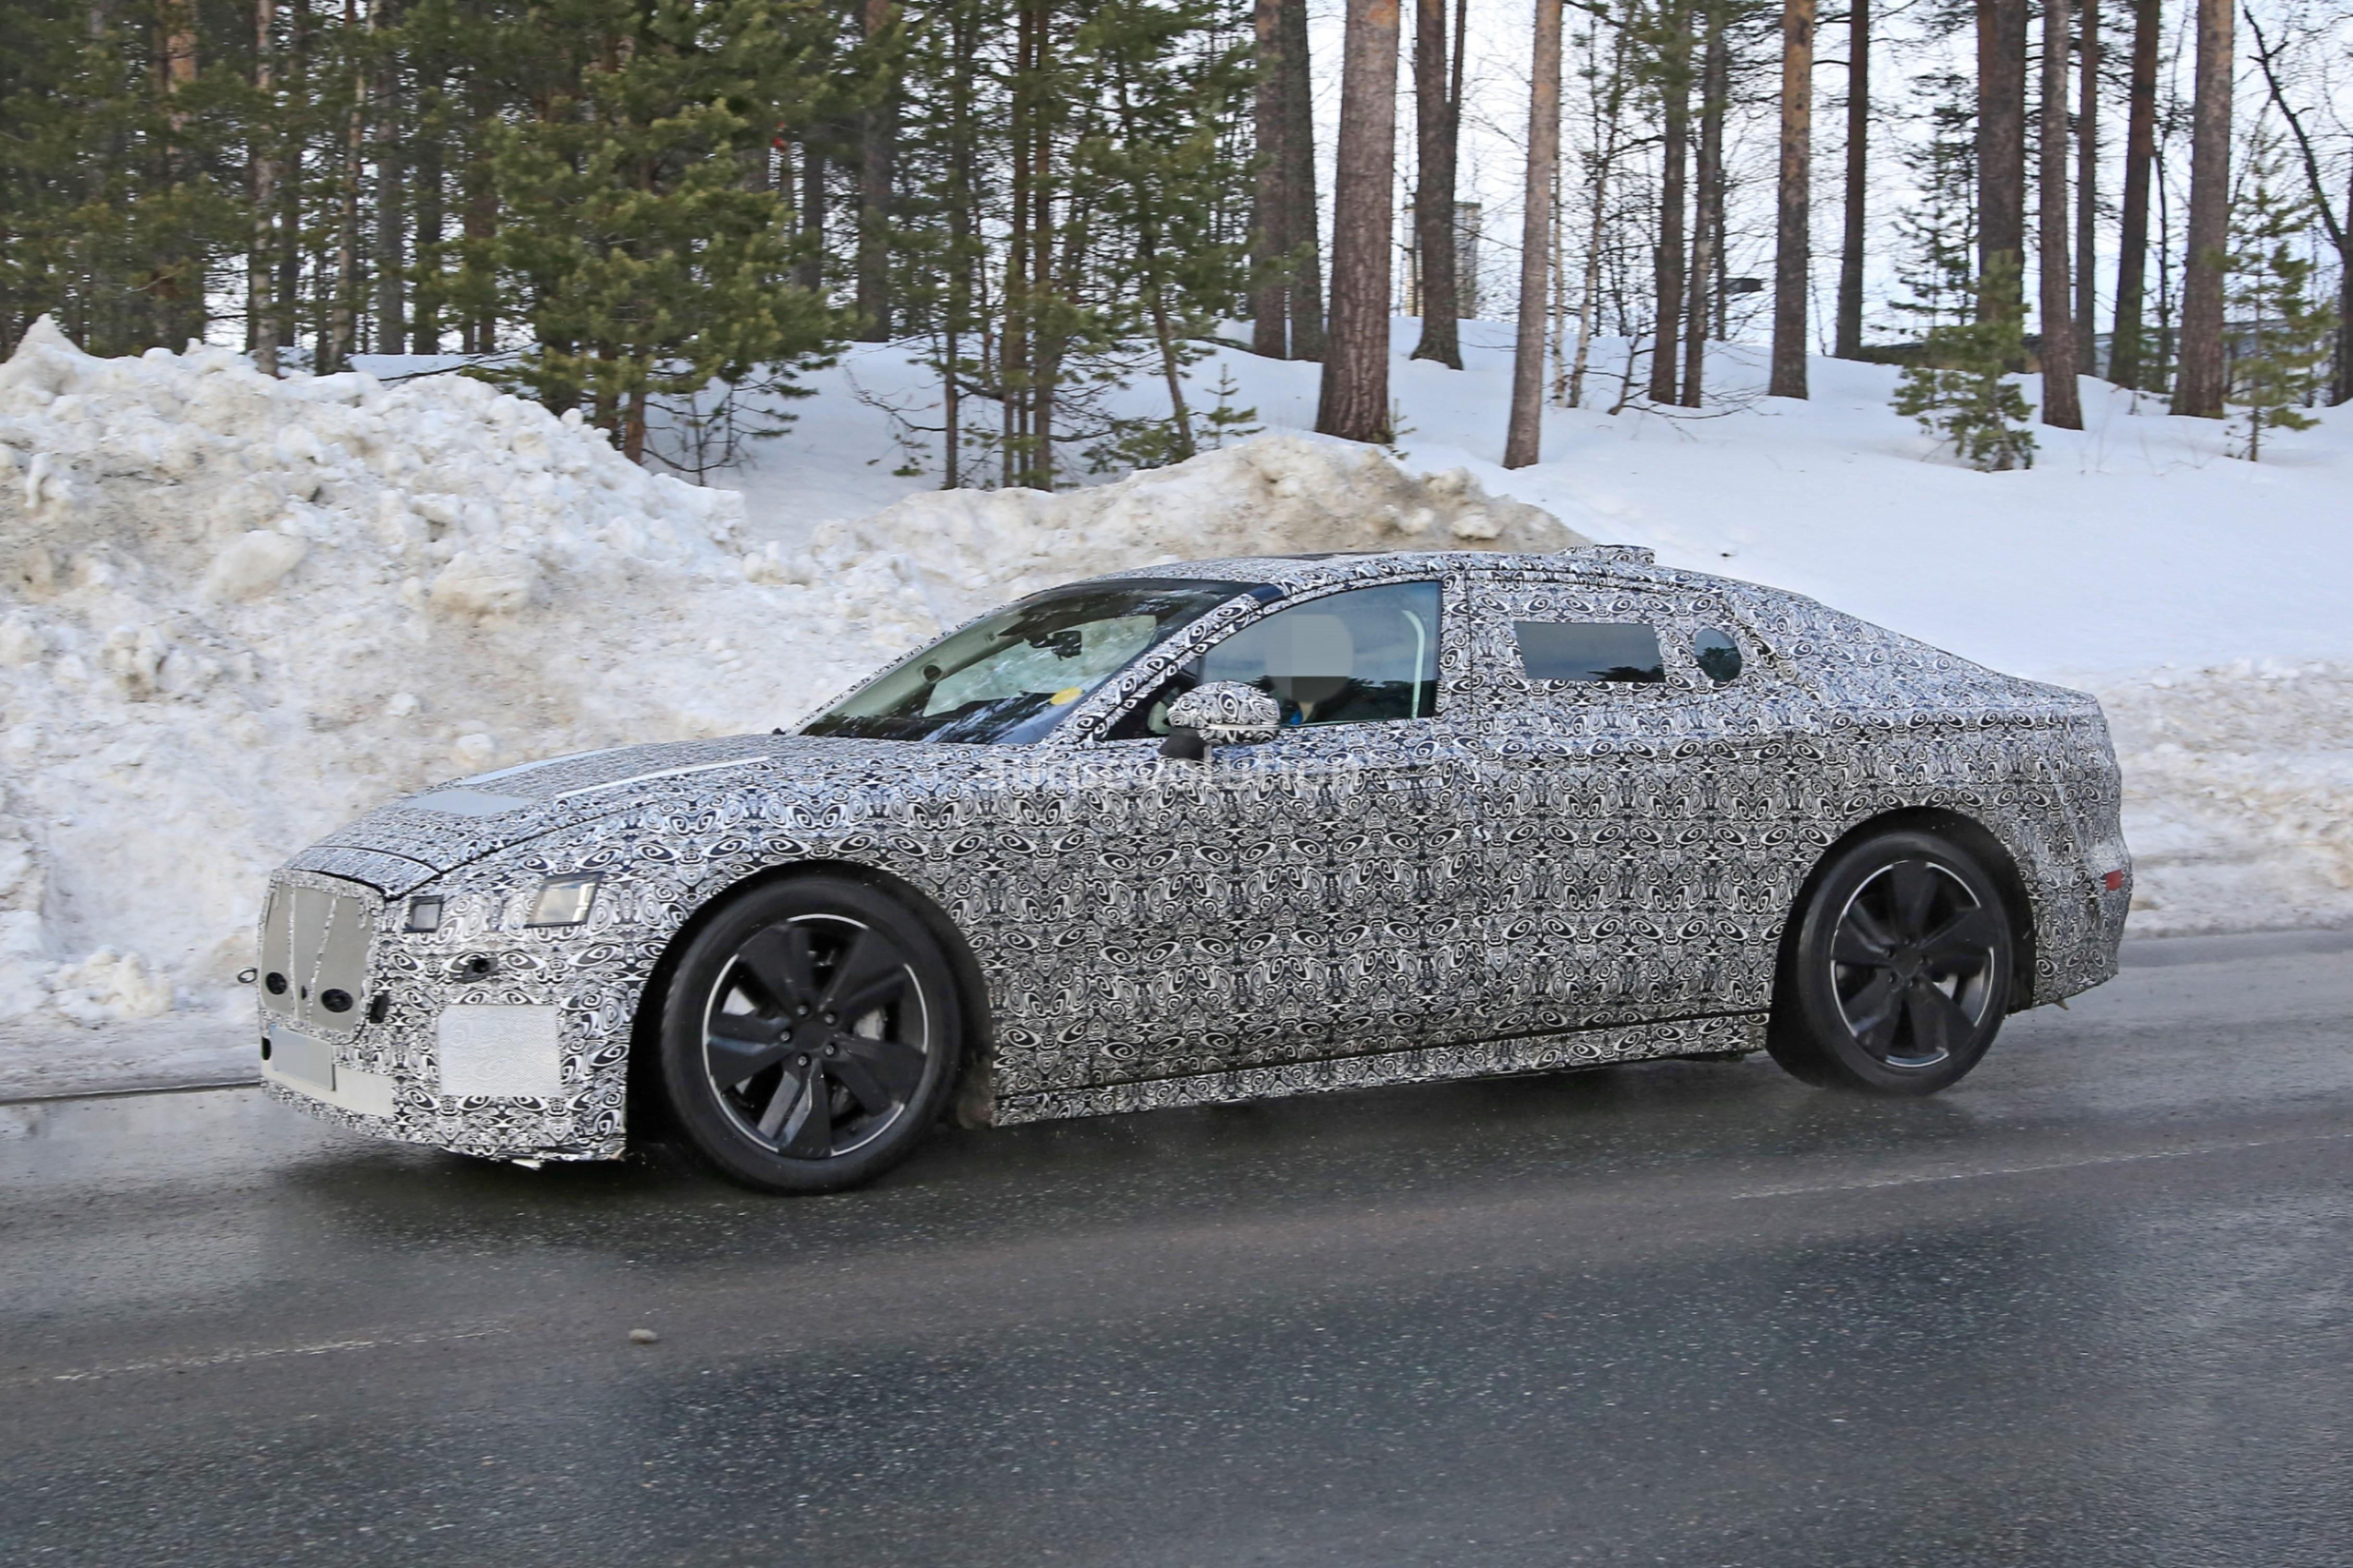 2021 jaguar xj spied braving the cold, ev prototype sports